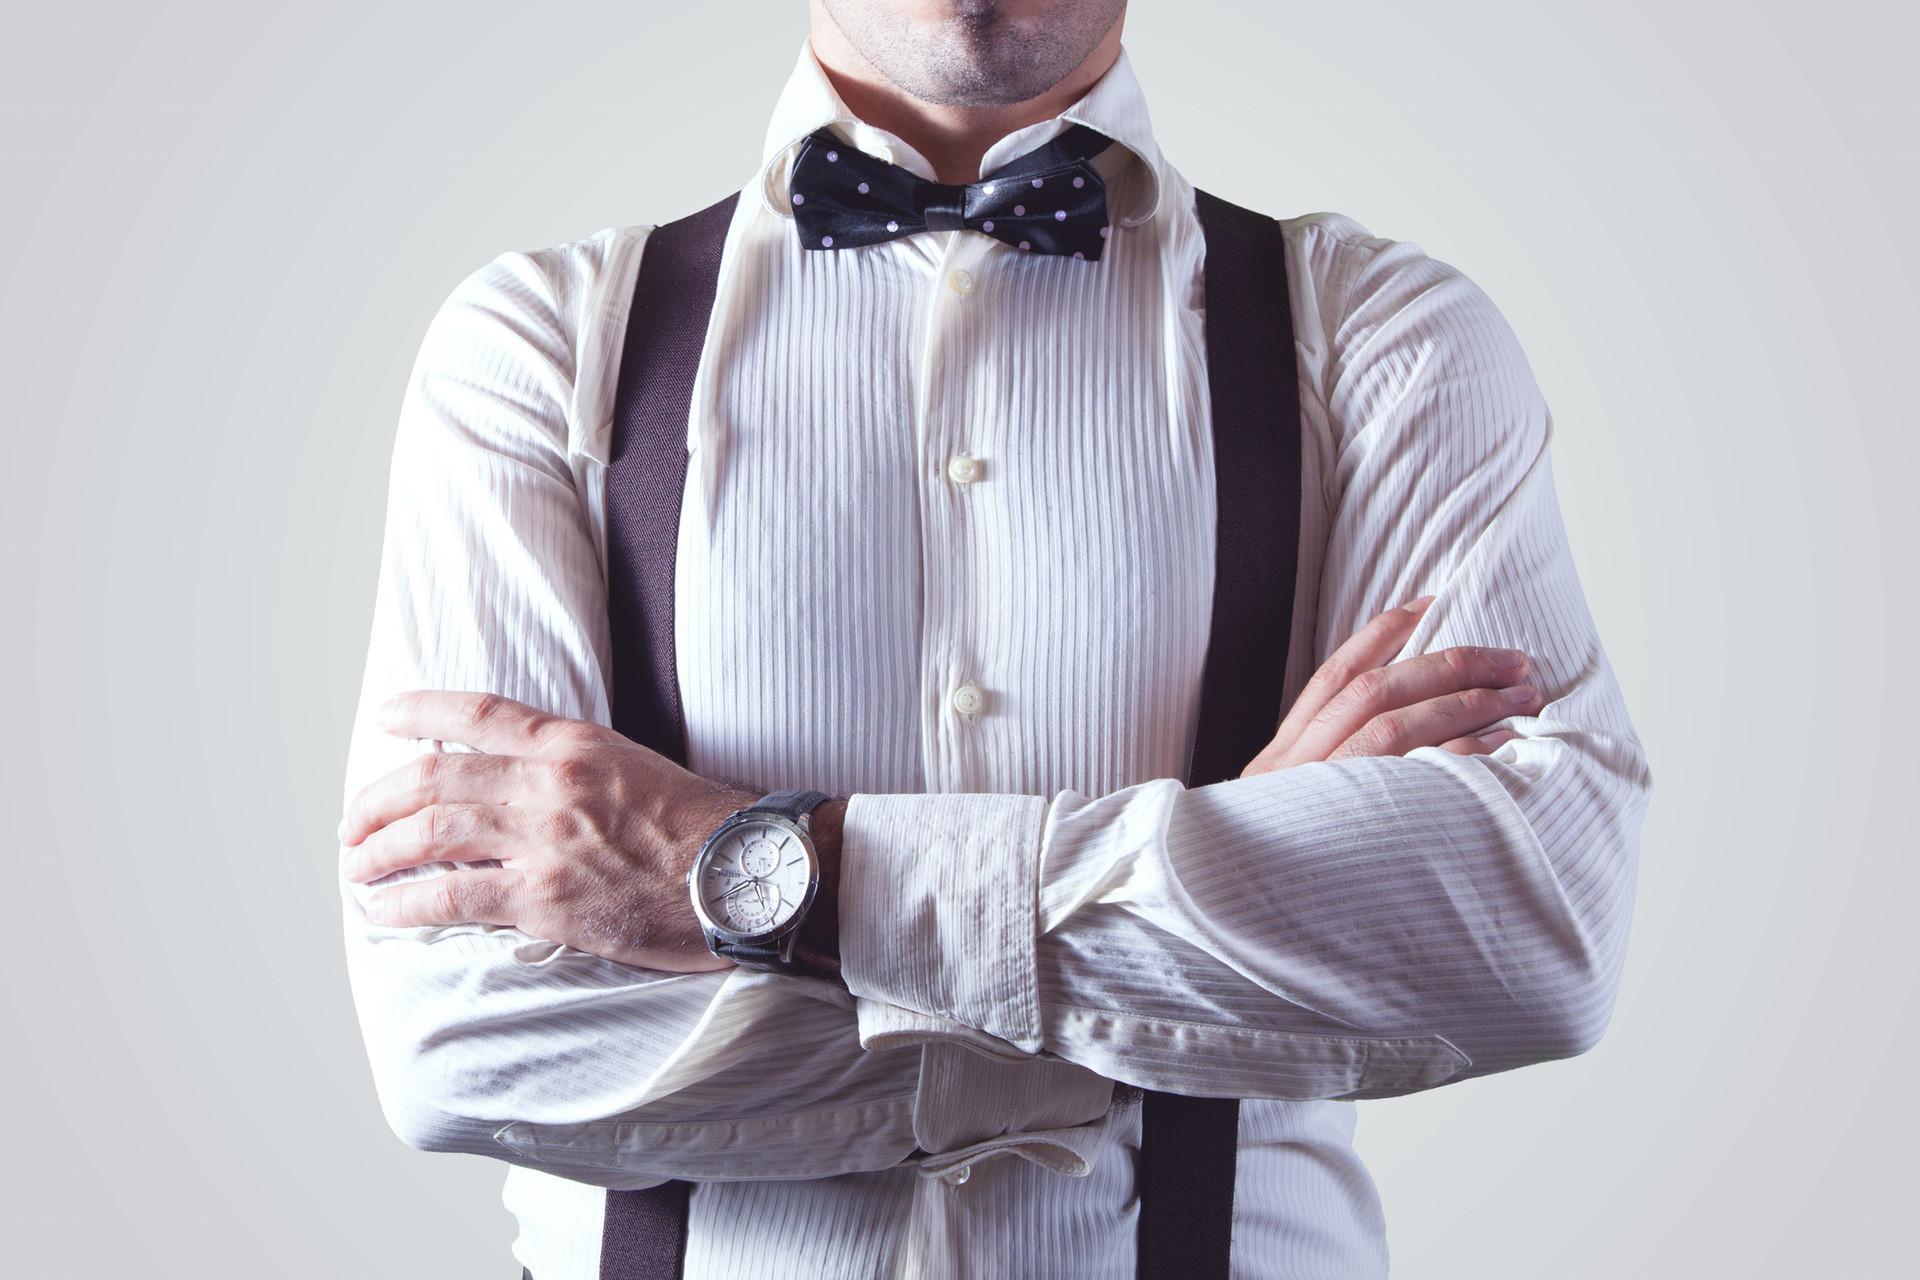 Tuxedo Fitting